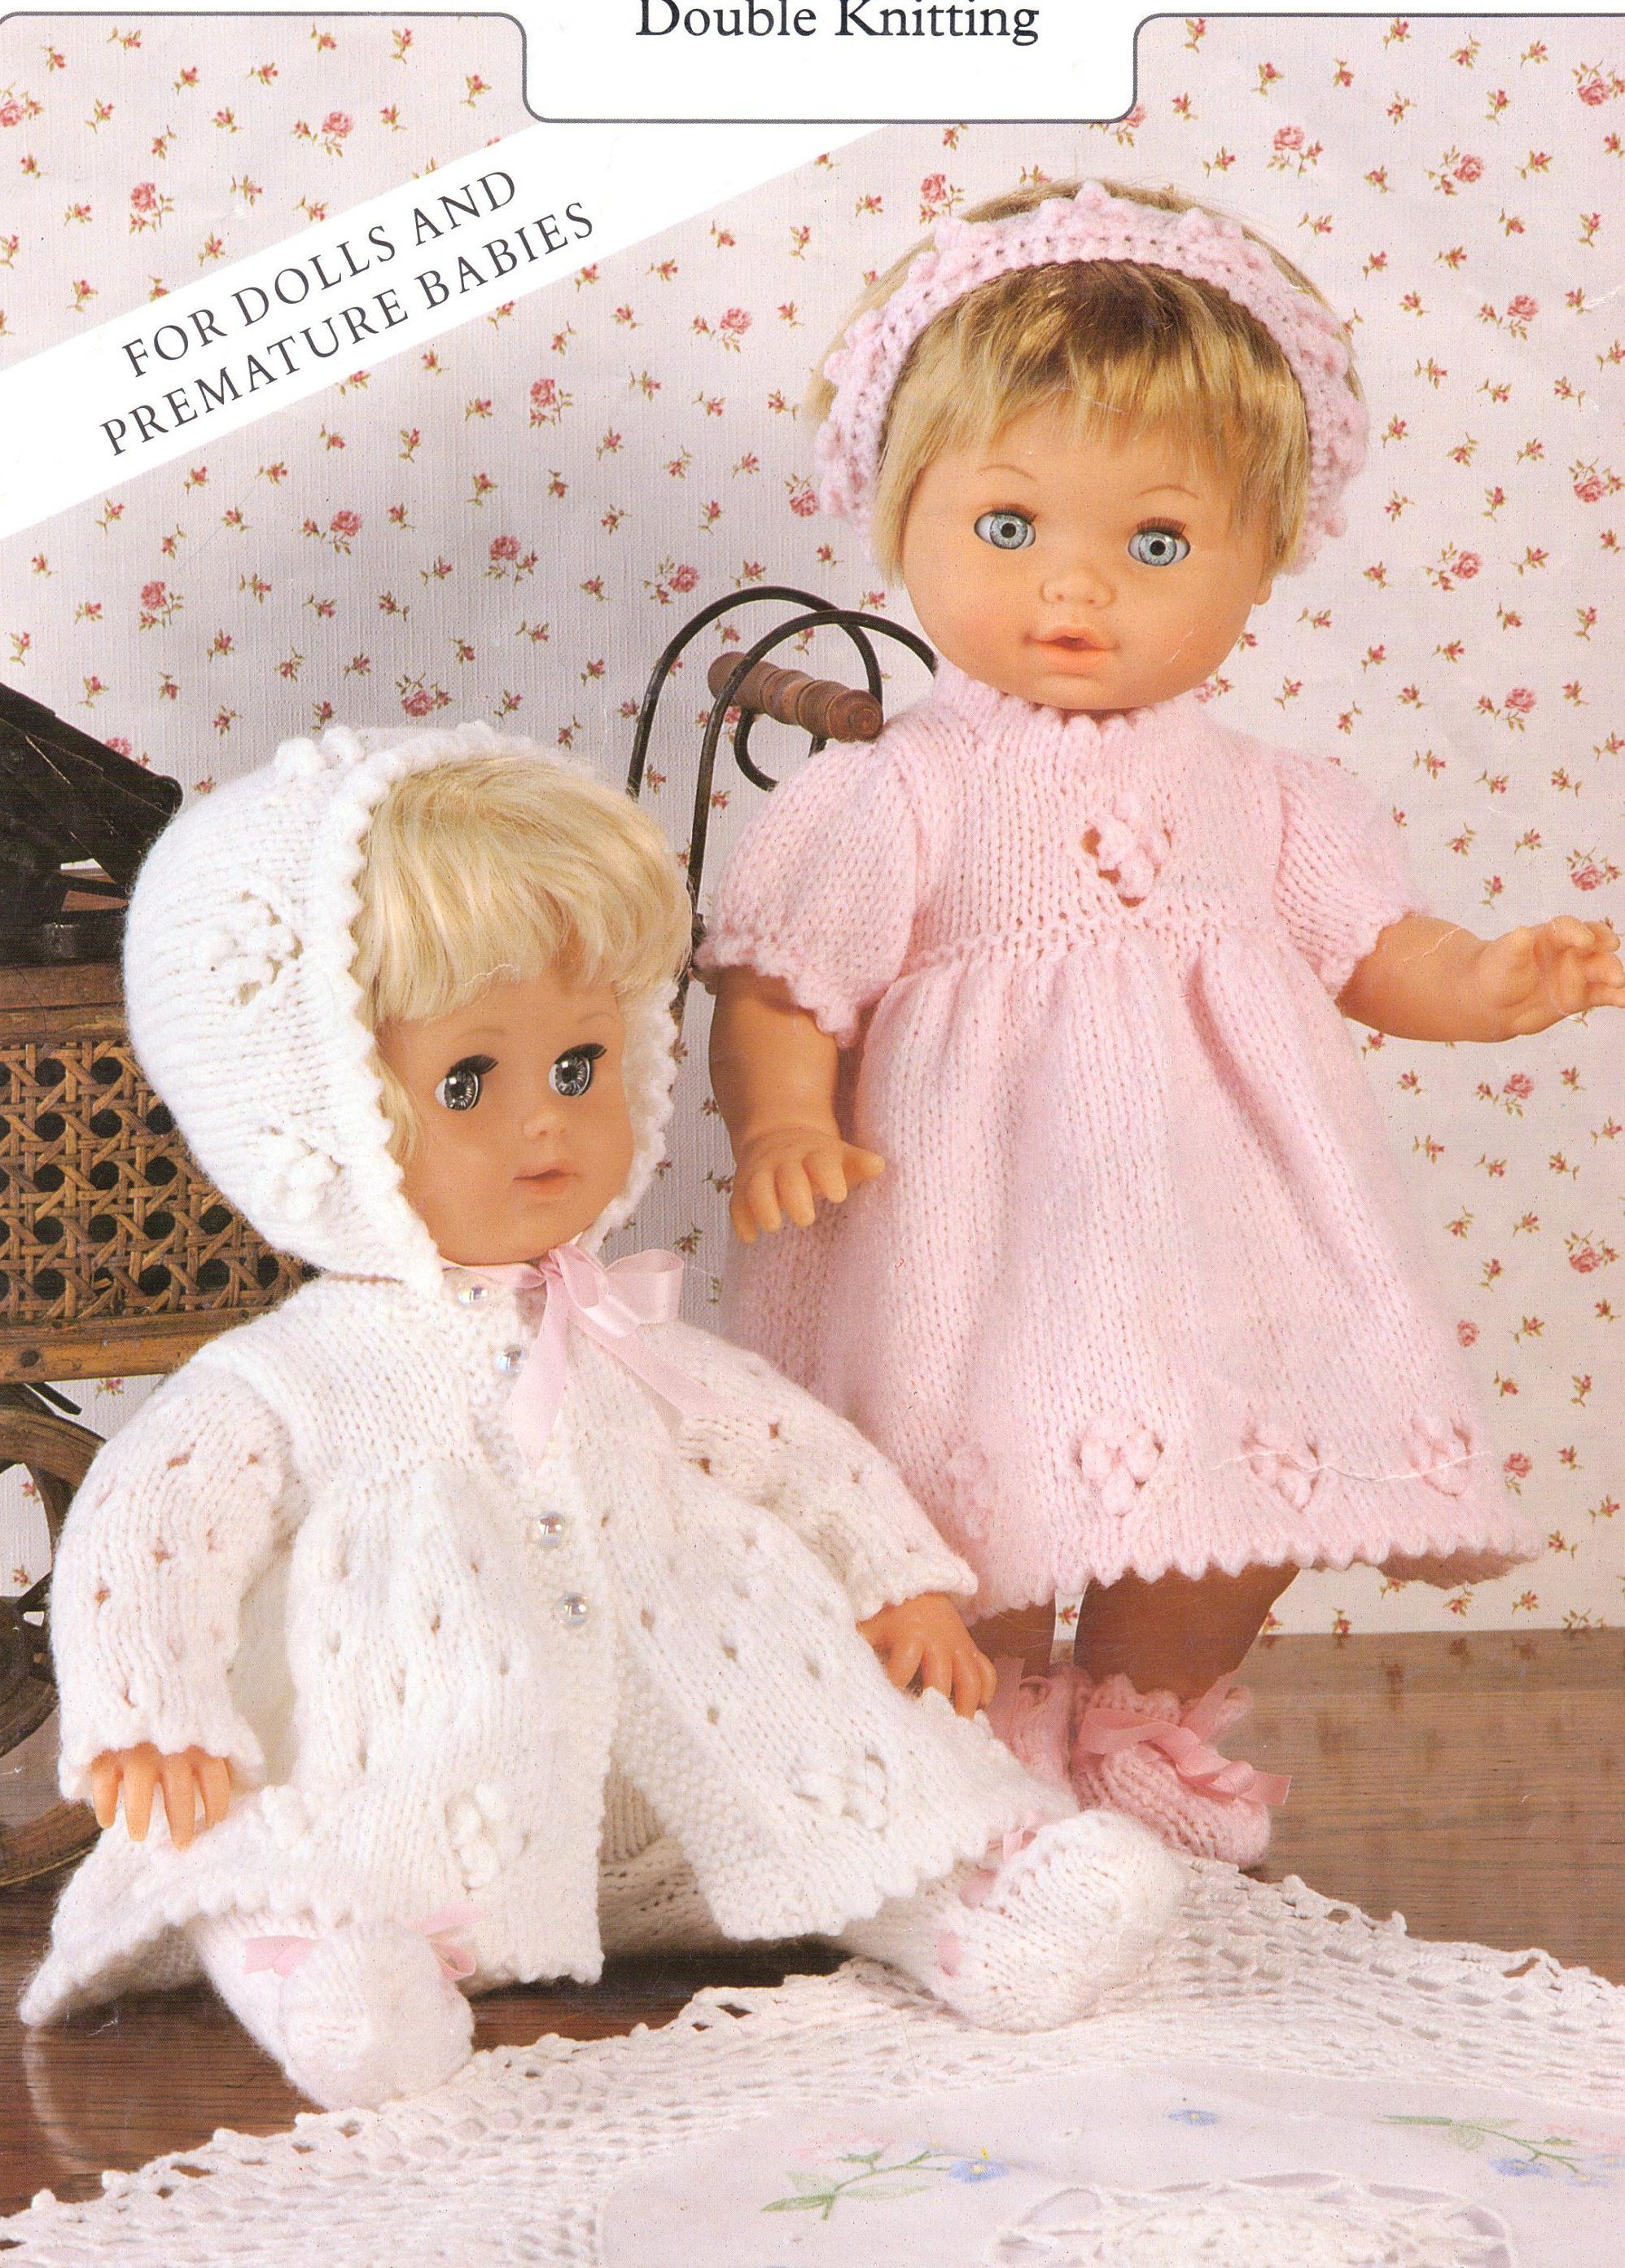 Baby Dolls Knitting Patterns Outfit Dress Leggings Jacket Headband ...